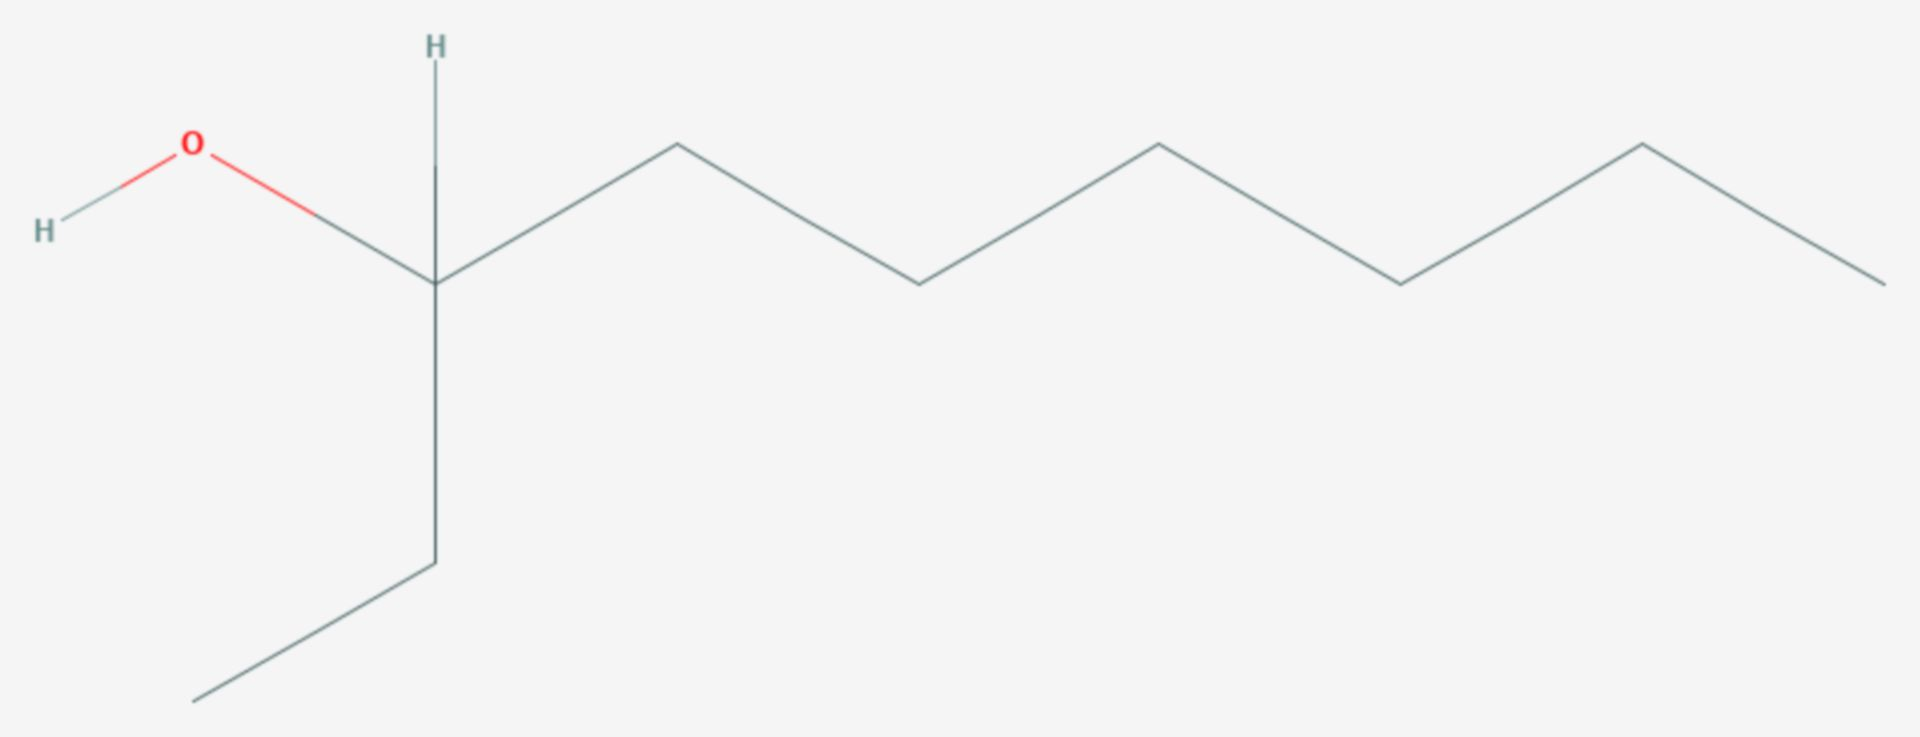 3-Nonanol (Strukturformel)